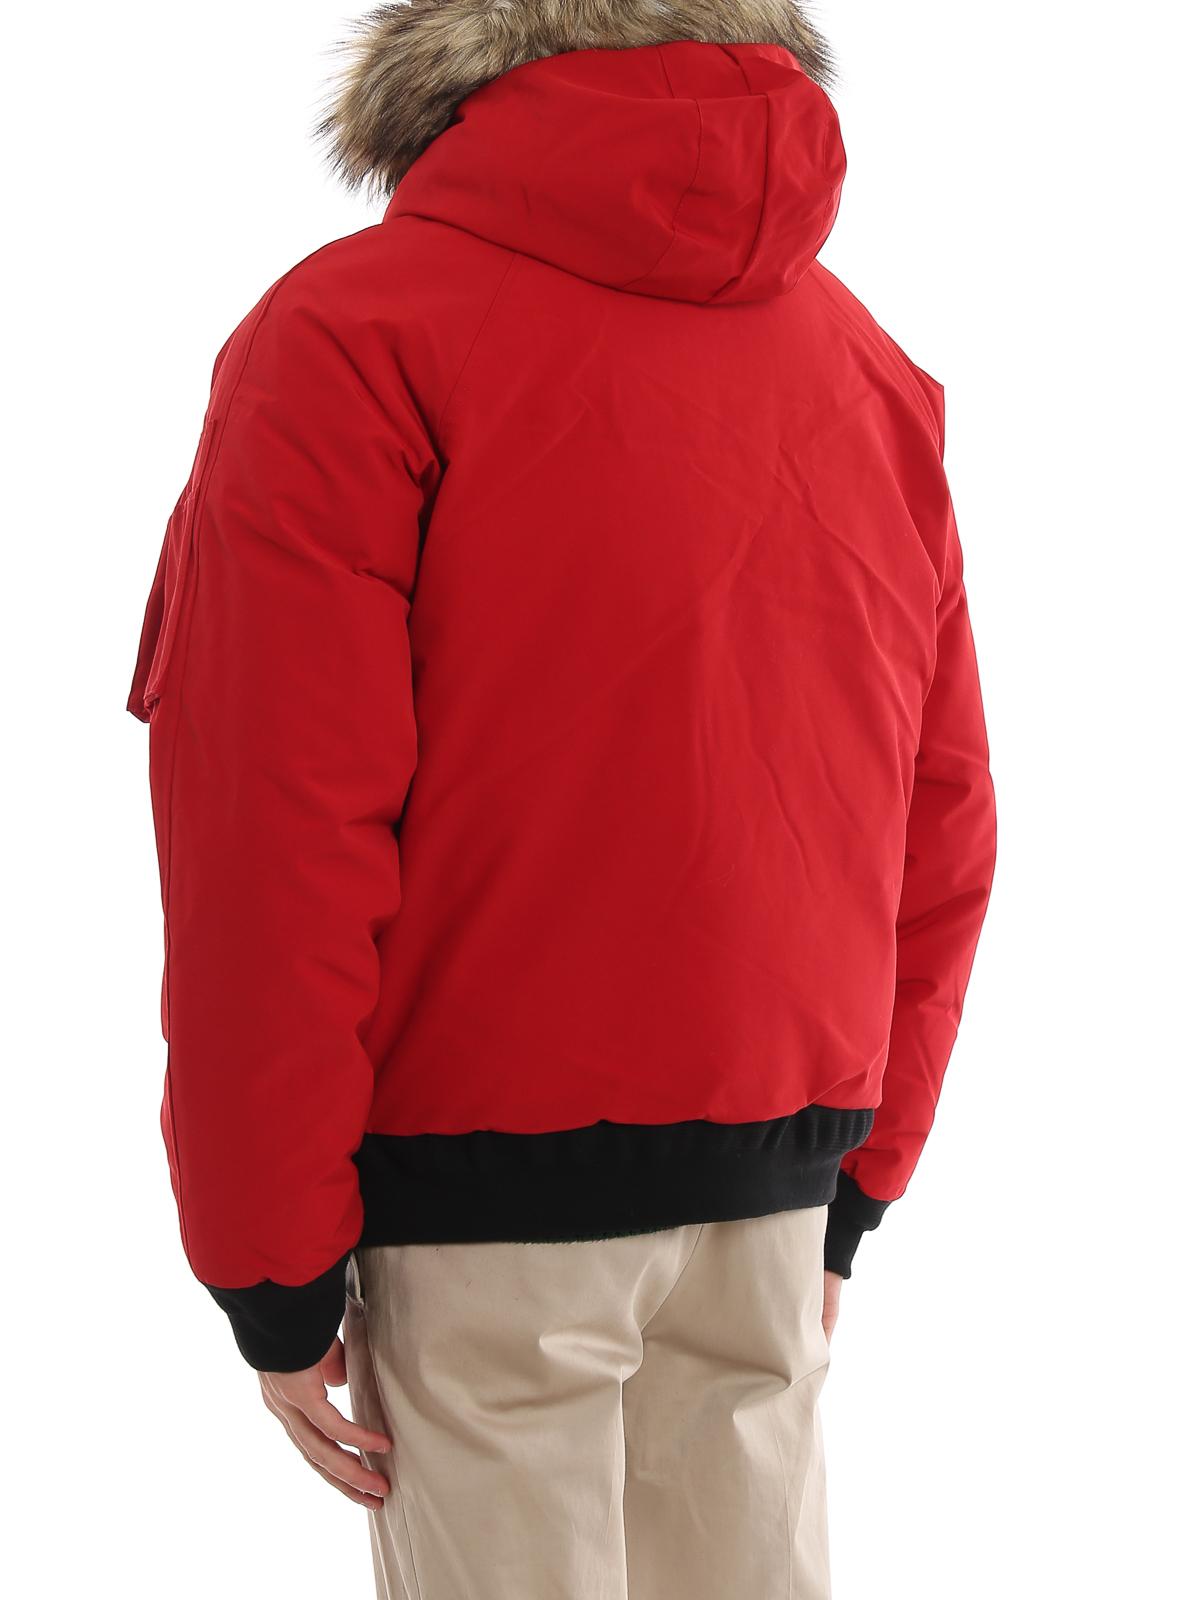 Polo Ralph Lauren Daunenjacke Rot Kurze Daunenjacken